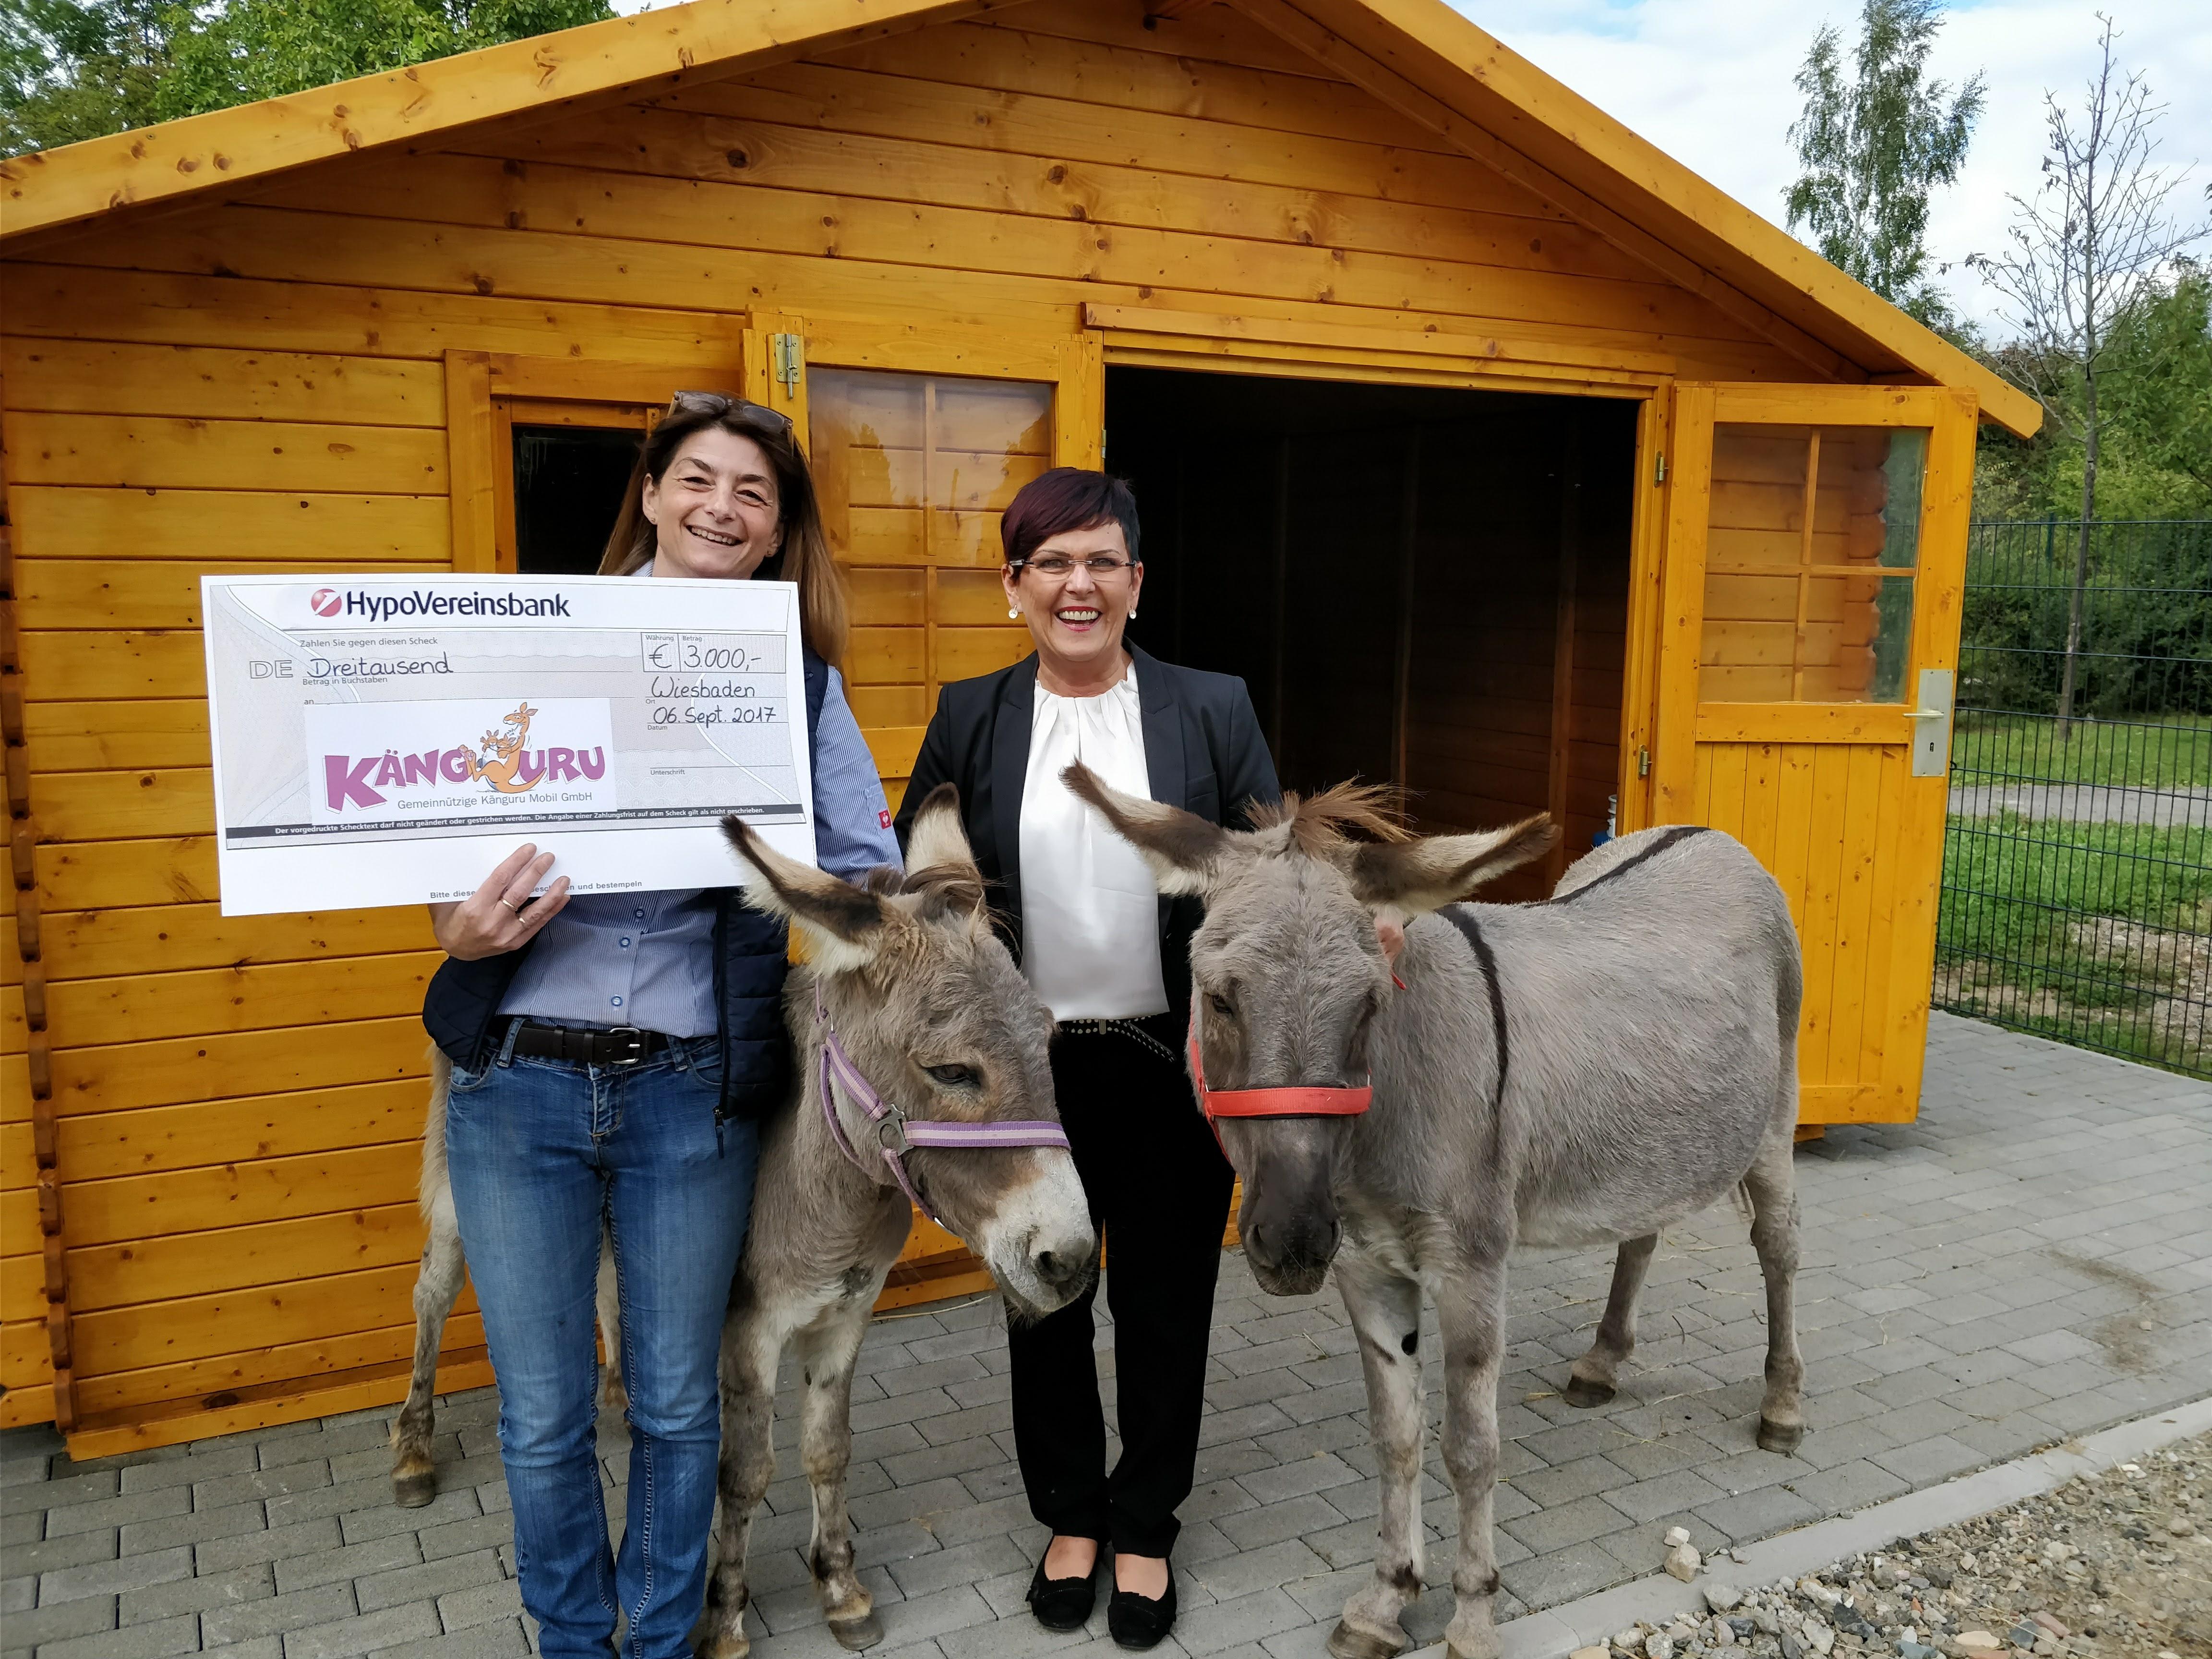 Hypovereinsbank Unicredit Soziales Engagement Känguru ifb-Stiftung